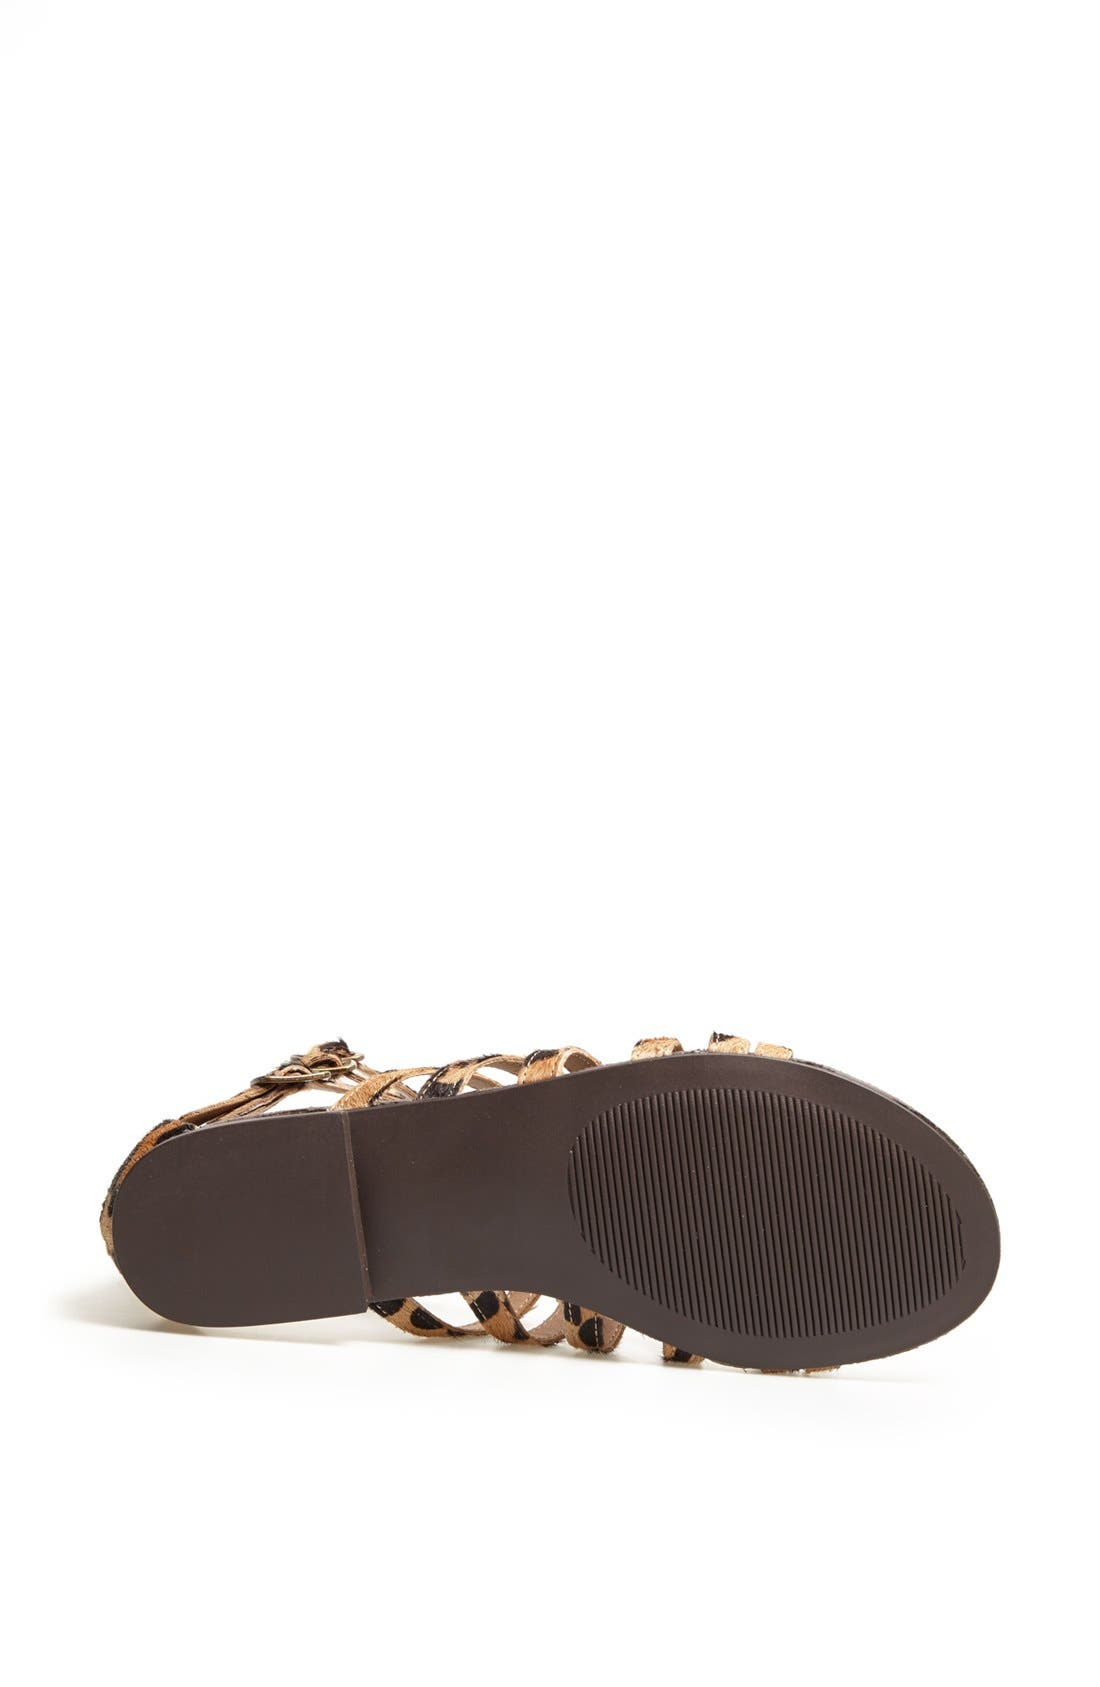 'Plato-S' Sandal,                             Alternate thumbnail 4, color,                             Leopard Stud